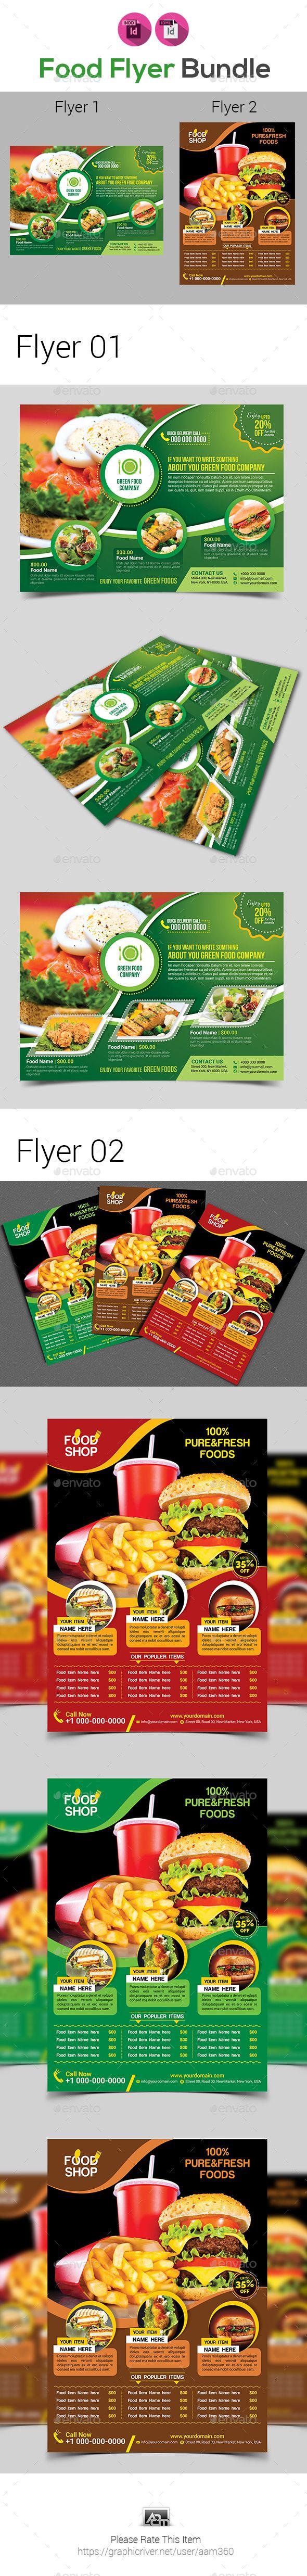 Food Flyer Template Bundle  Restaurant Flyers Download Here